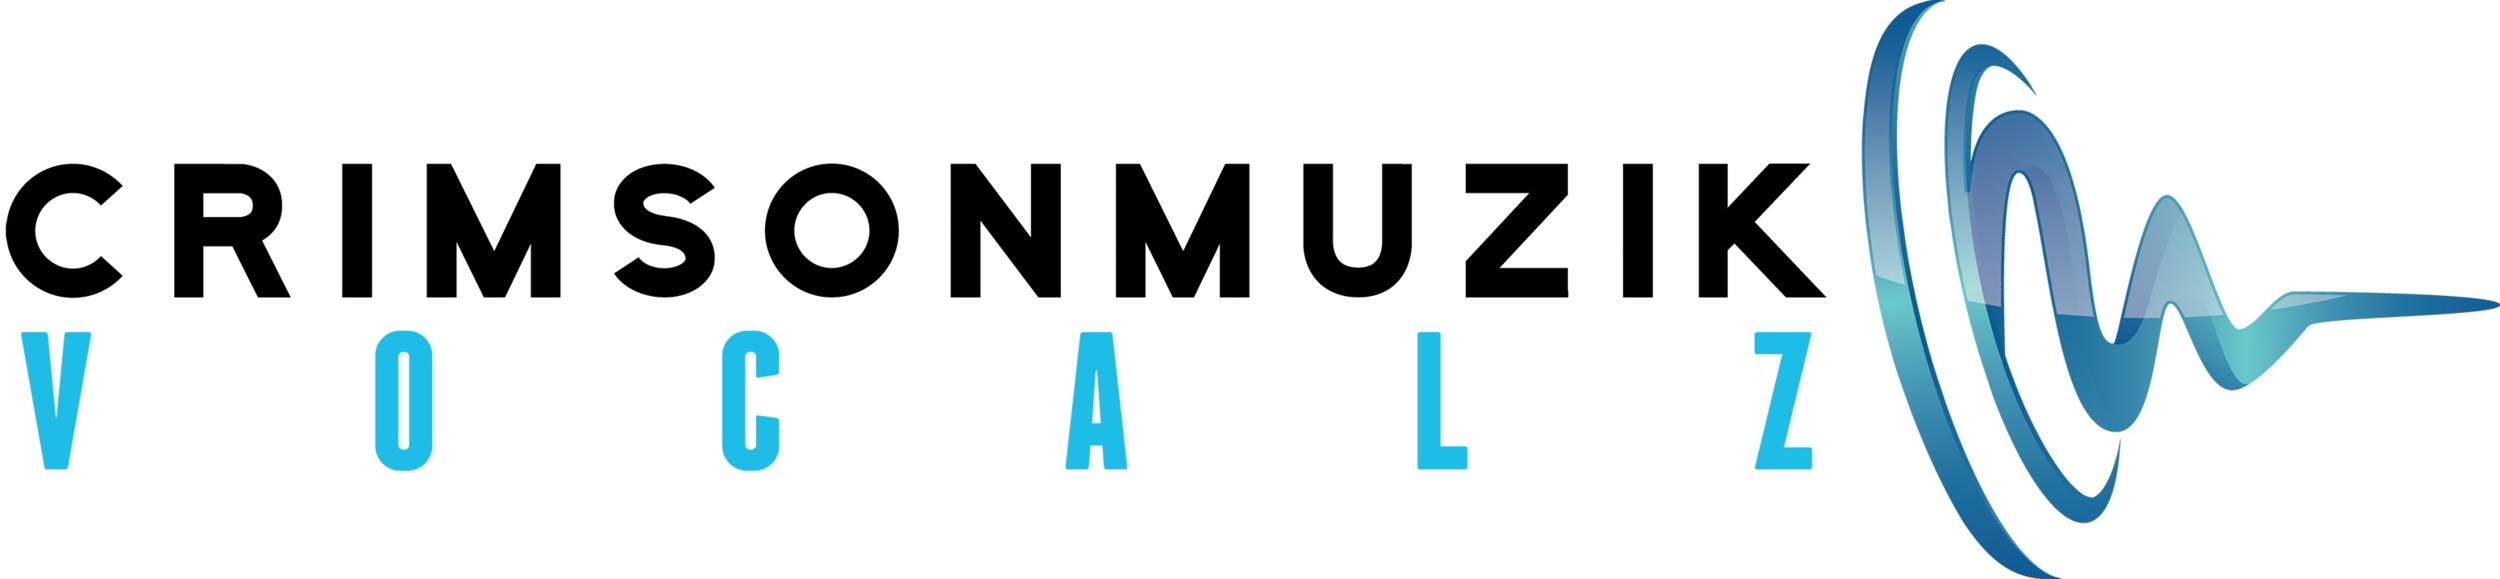 crimson muzik vocalz logo.png